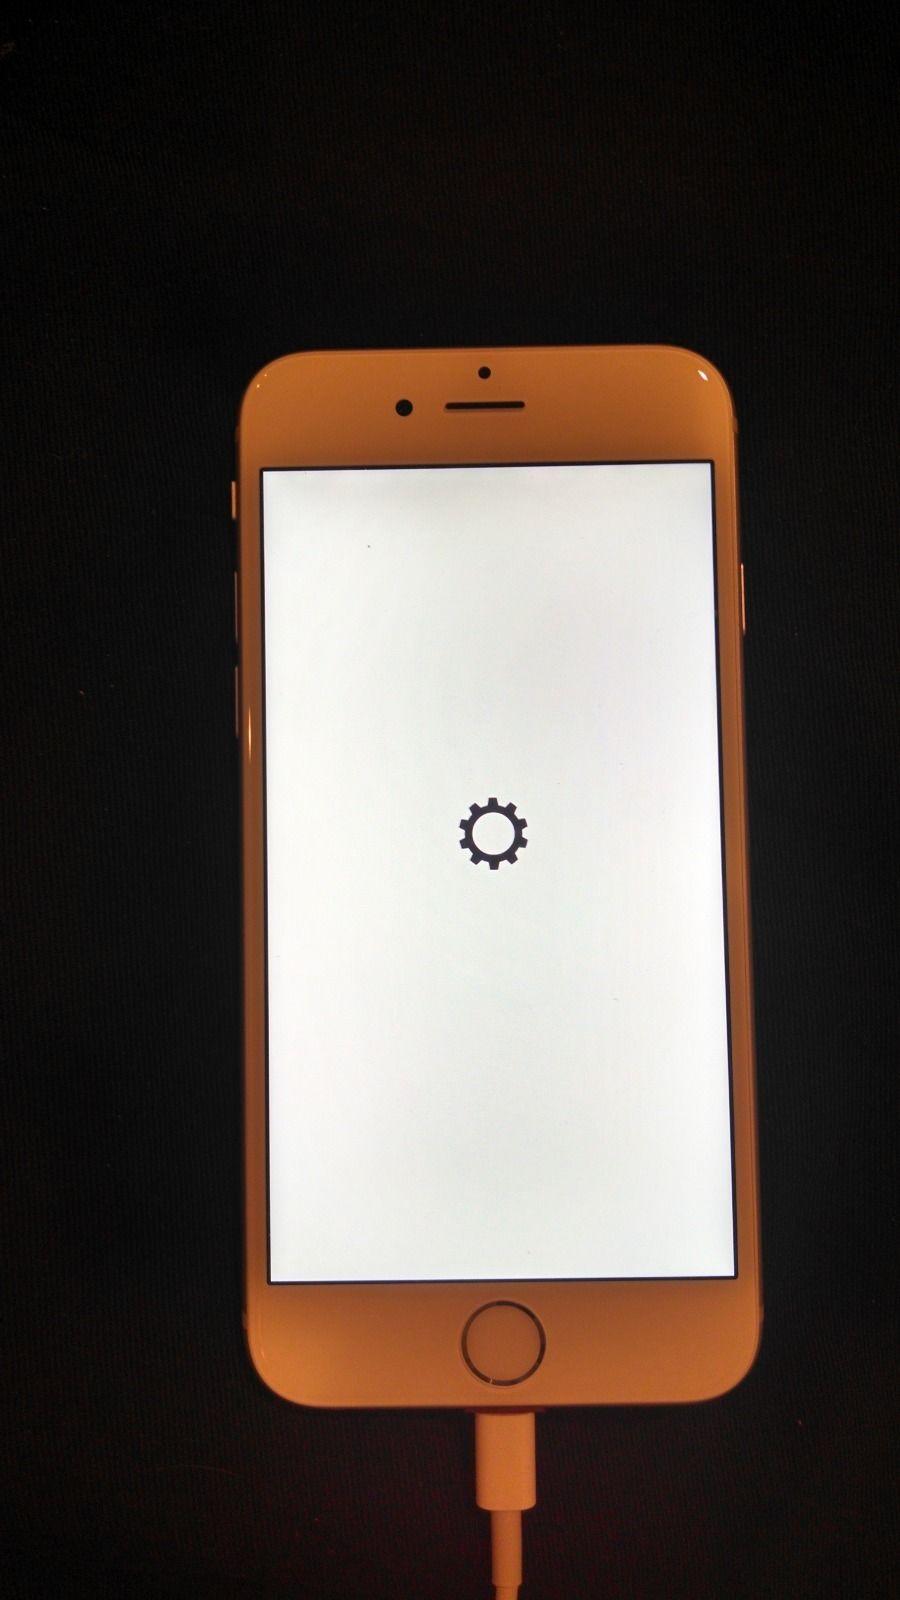 iphone-6-no-ebay-chega-a-brl-143mil-06